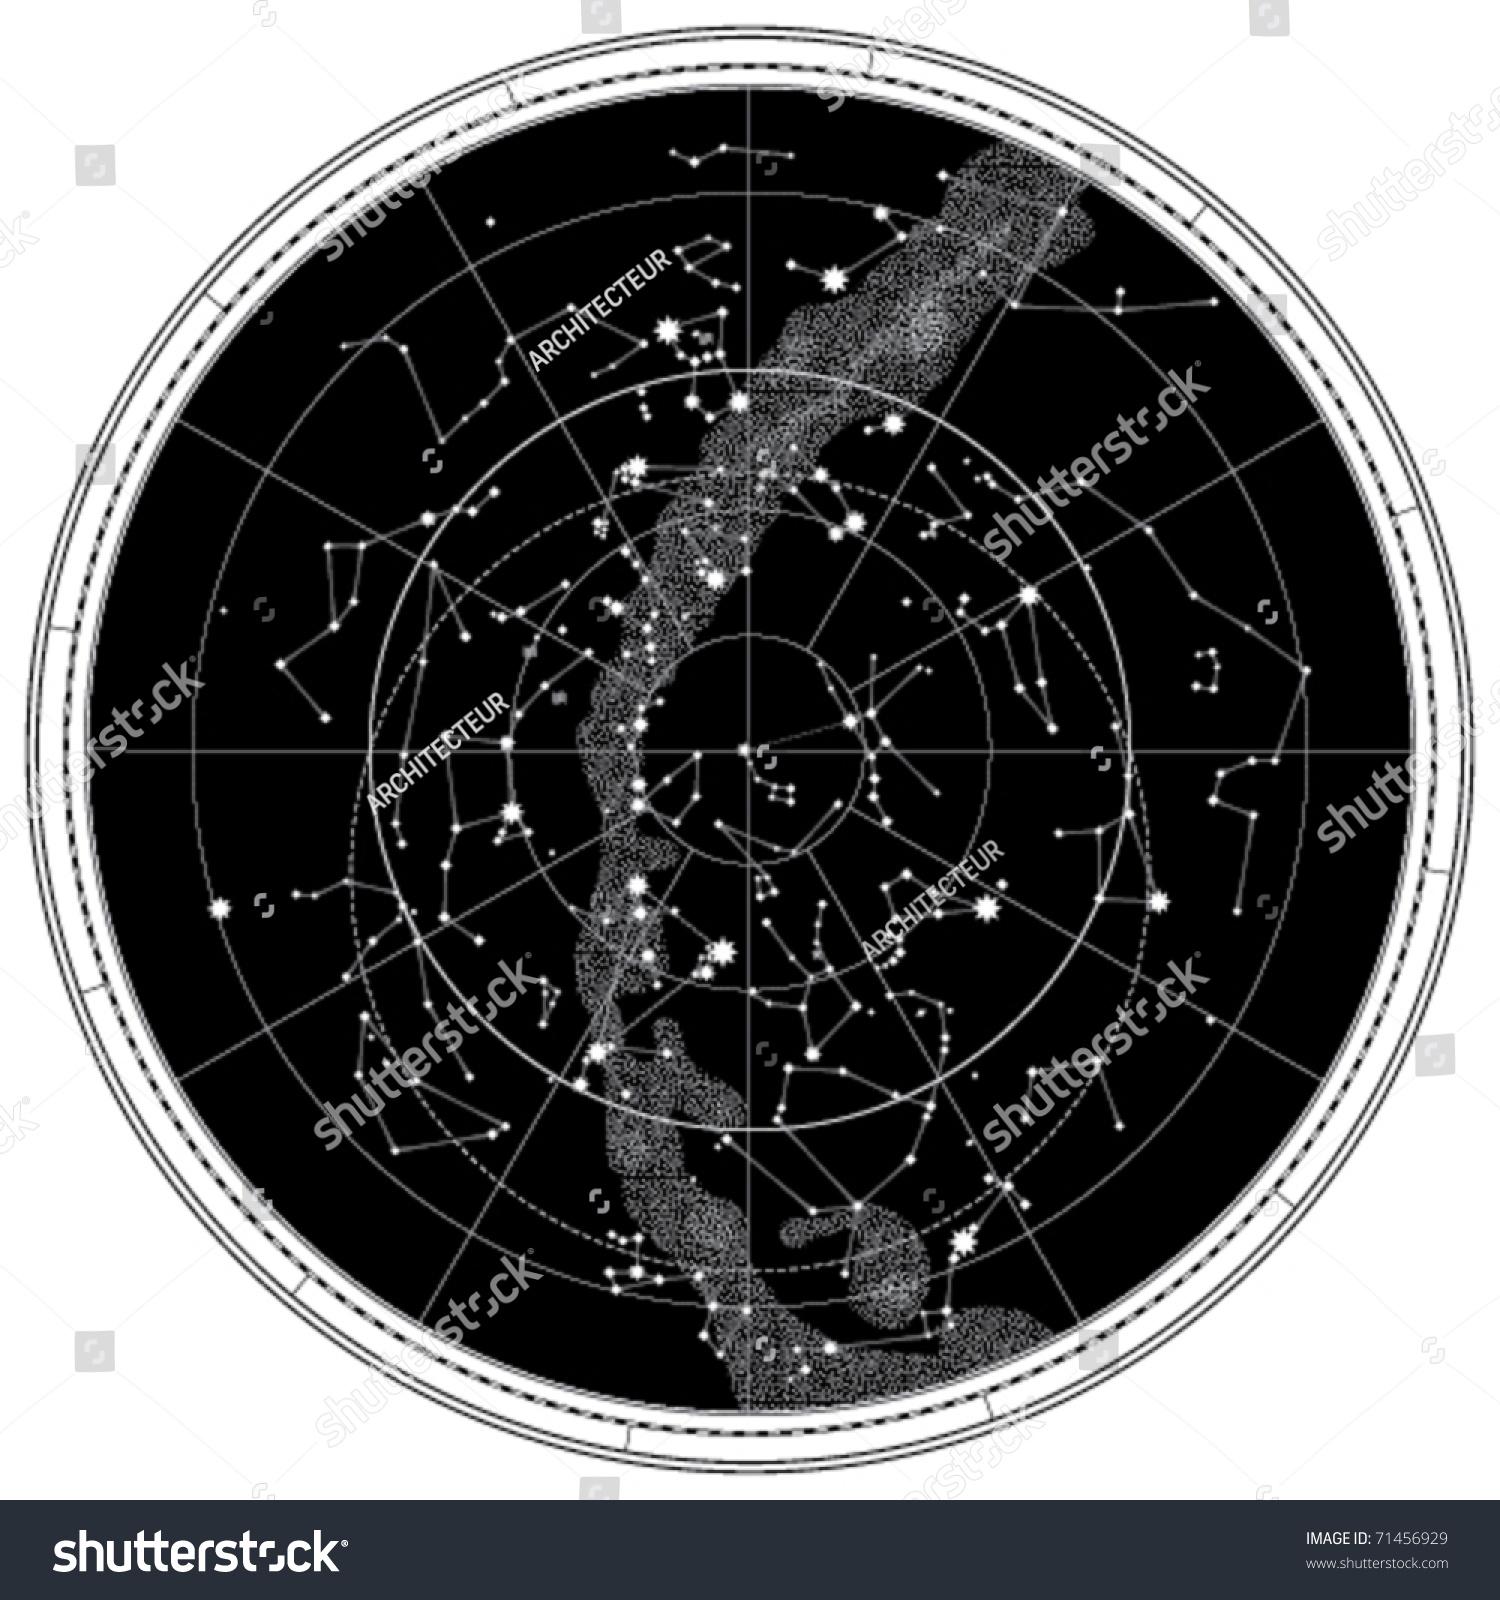 astronomy charts northern hemisphere - photo #48